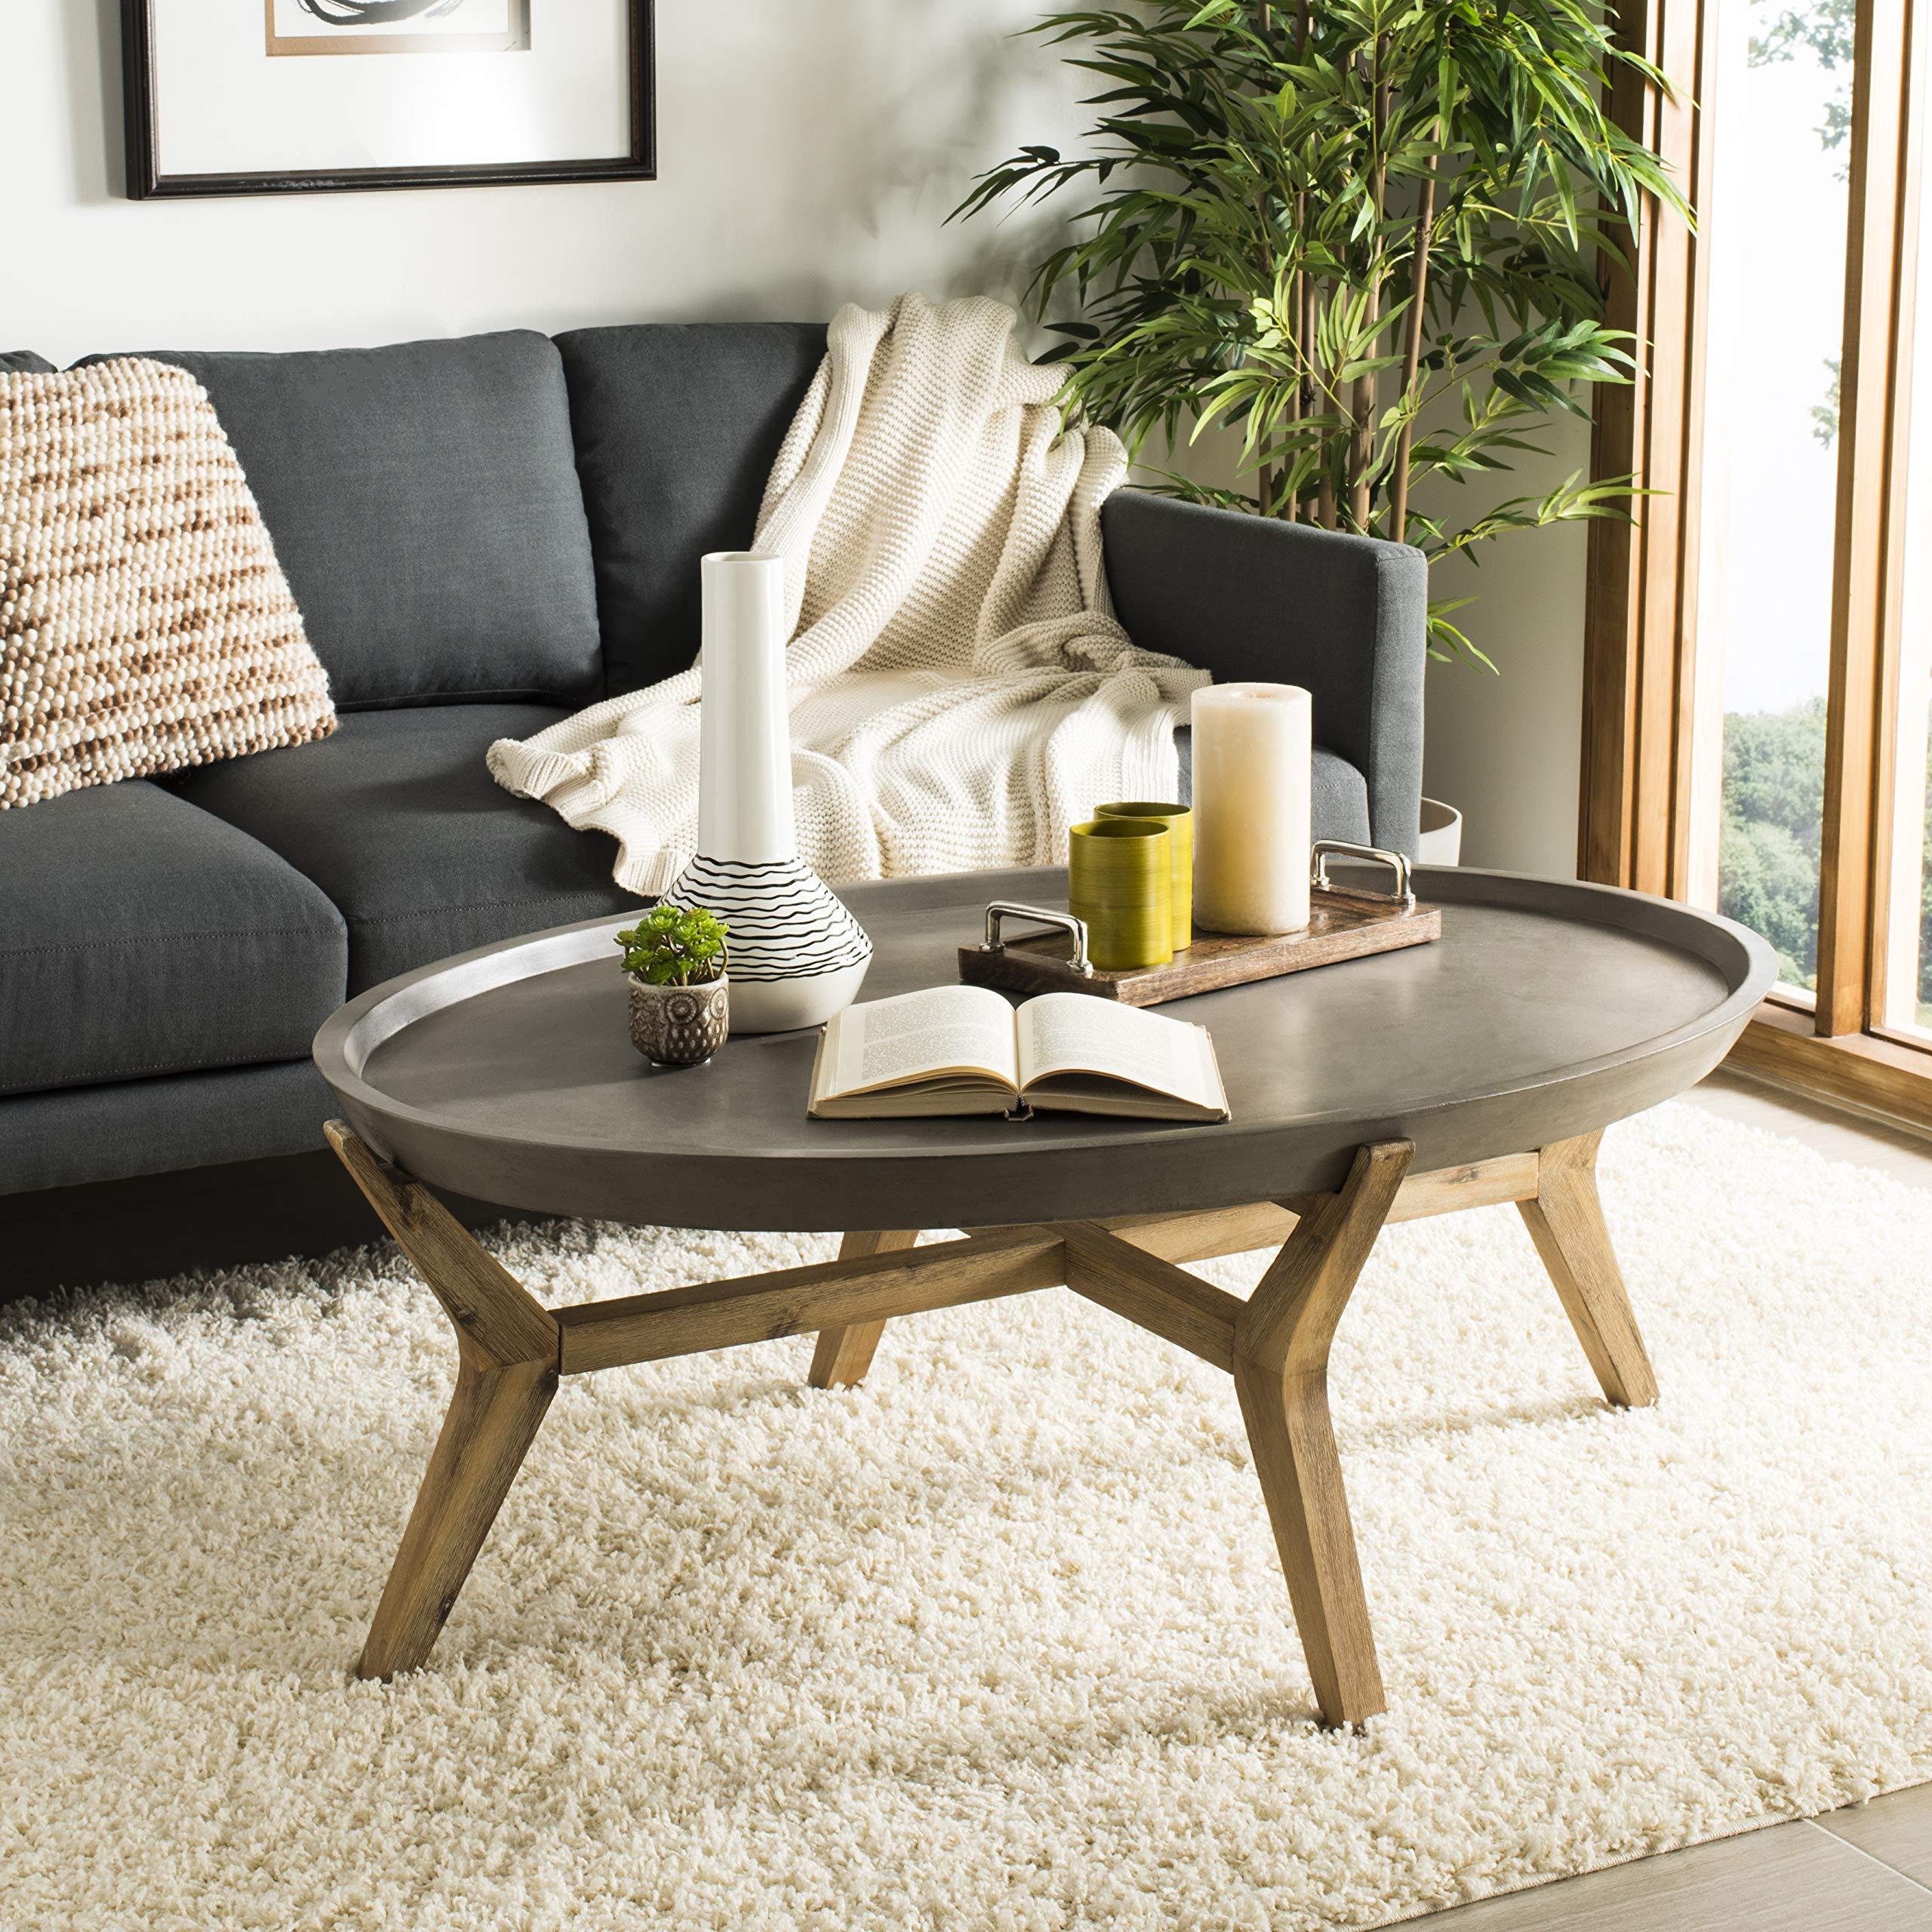 Safavieh VNN1021A Collection Hadwin Dark Grey Indoor/Outdoor Modern Concrete Oval 31.5'' Coffee Table